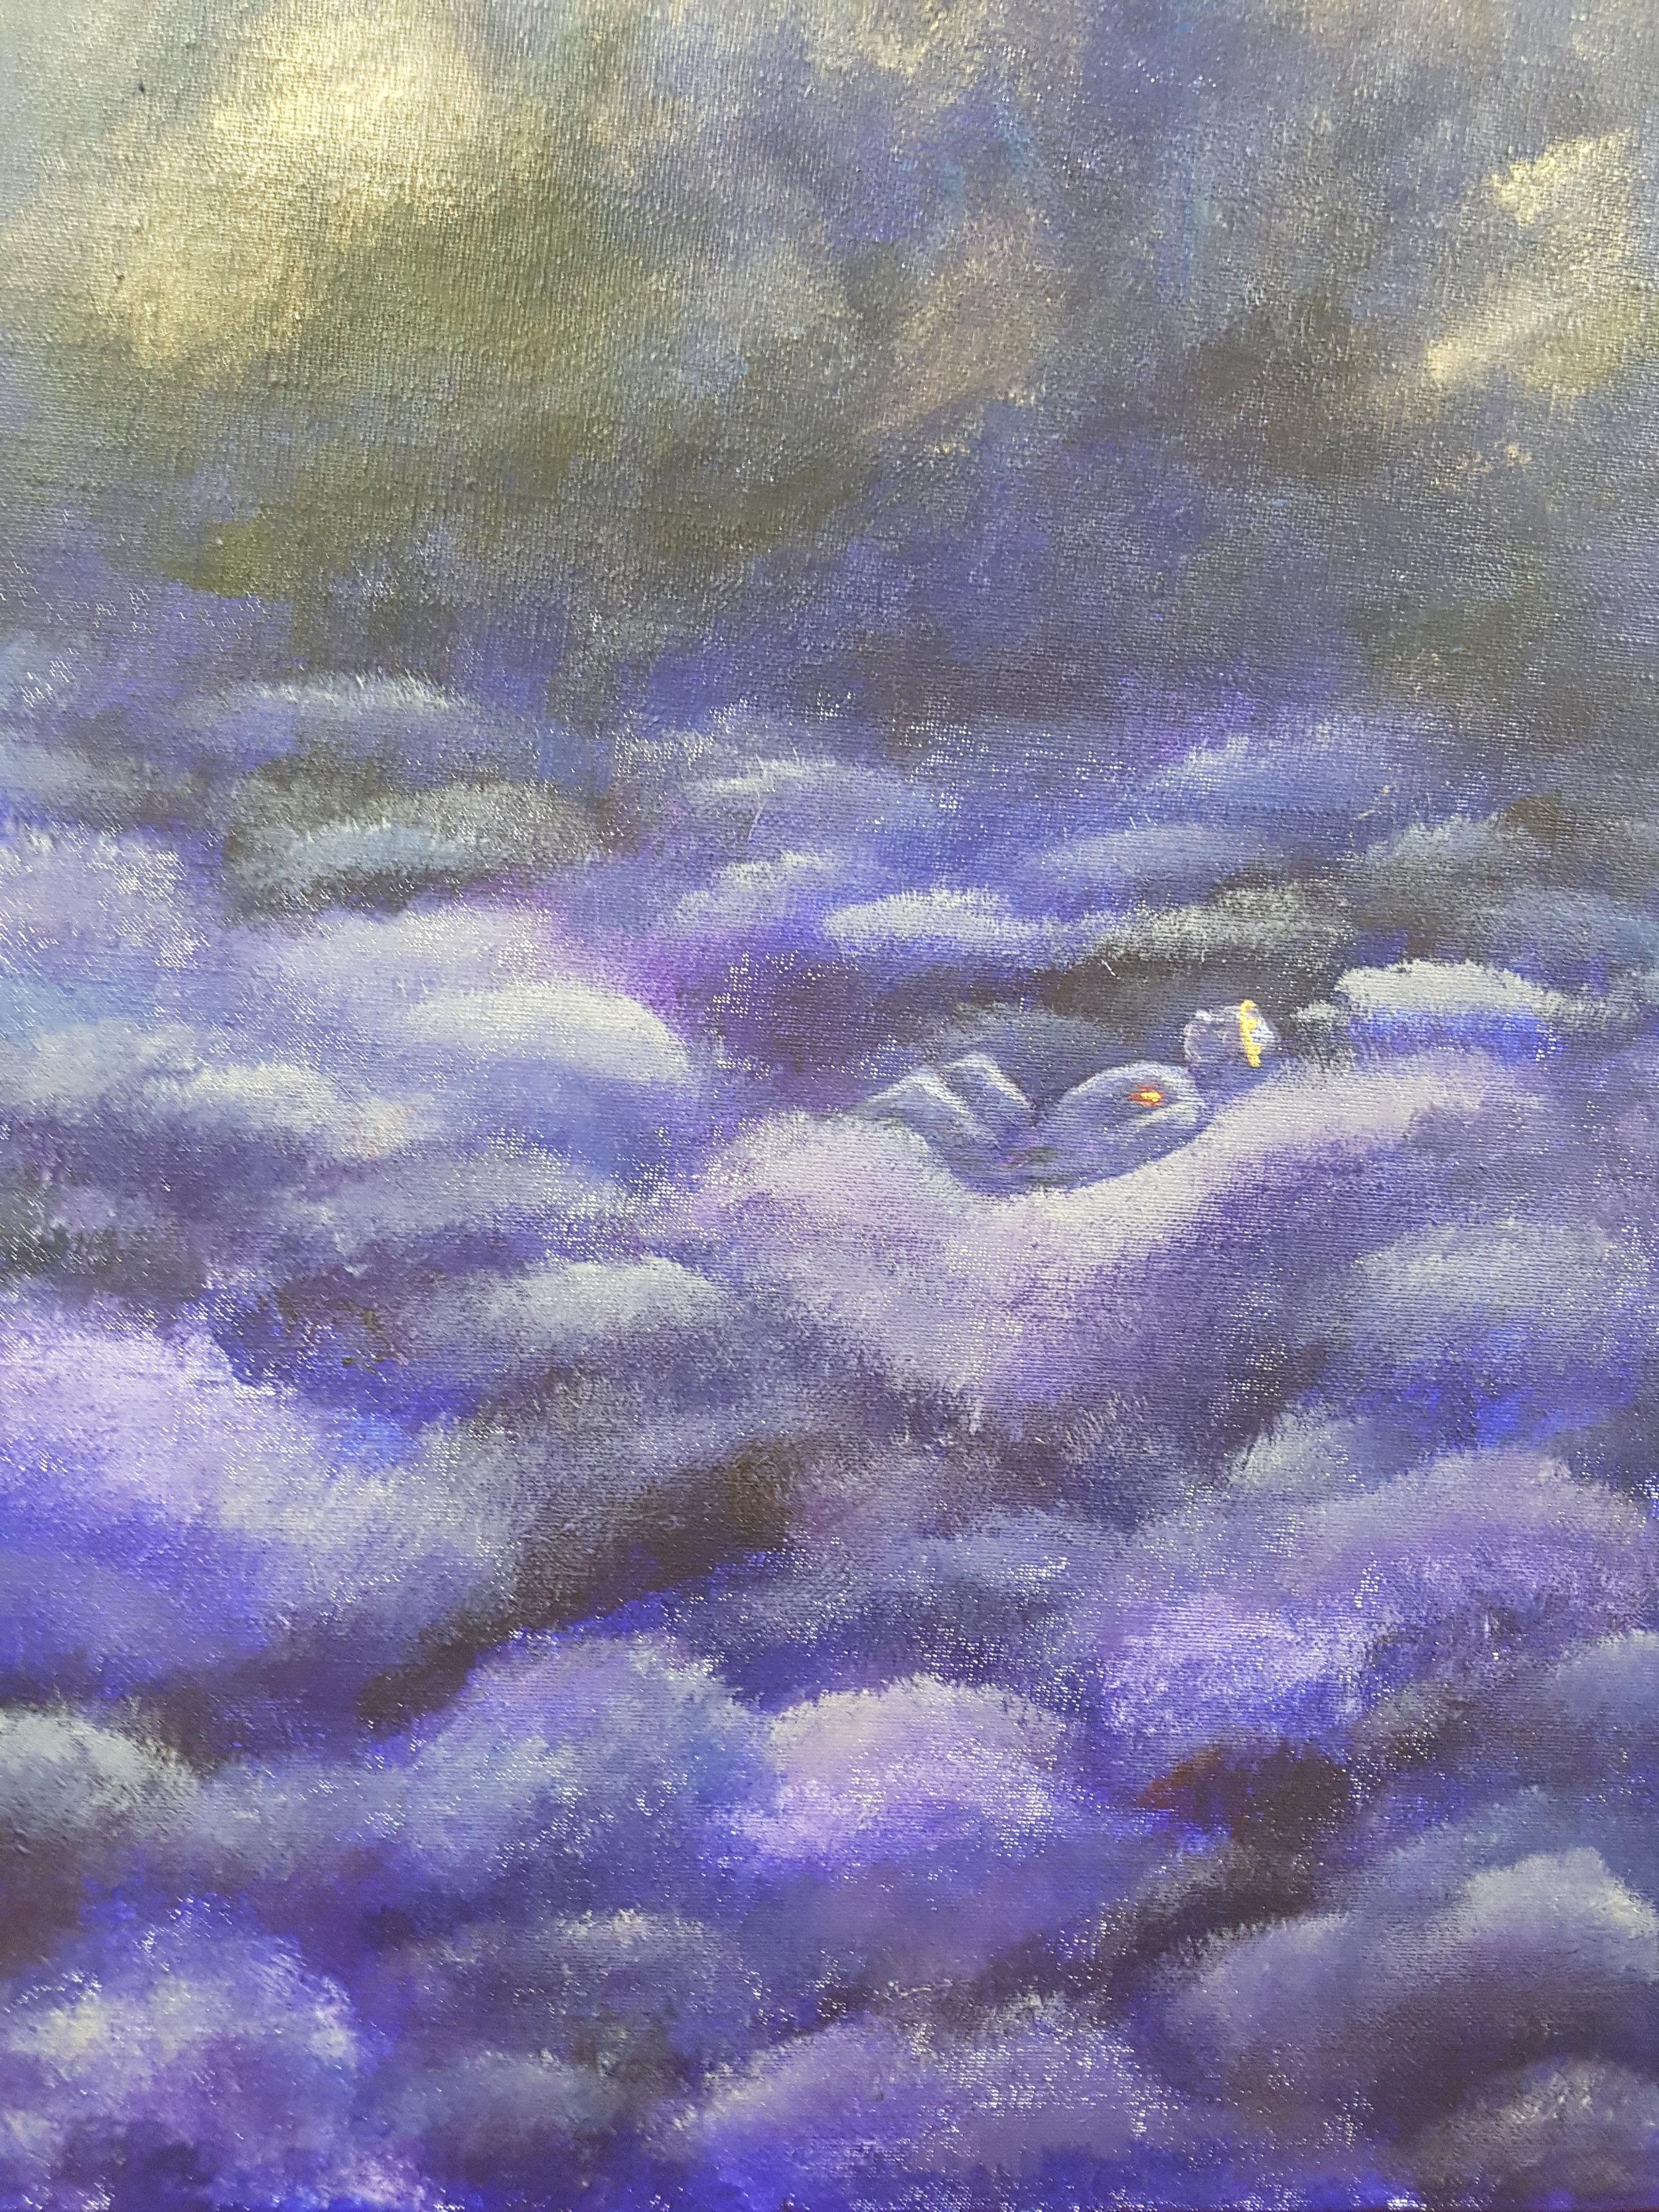 Resting in God's Embrace